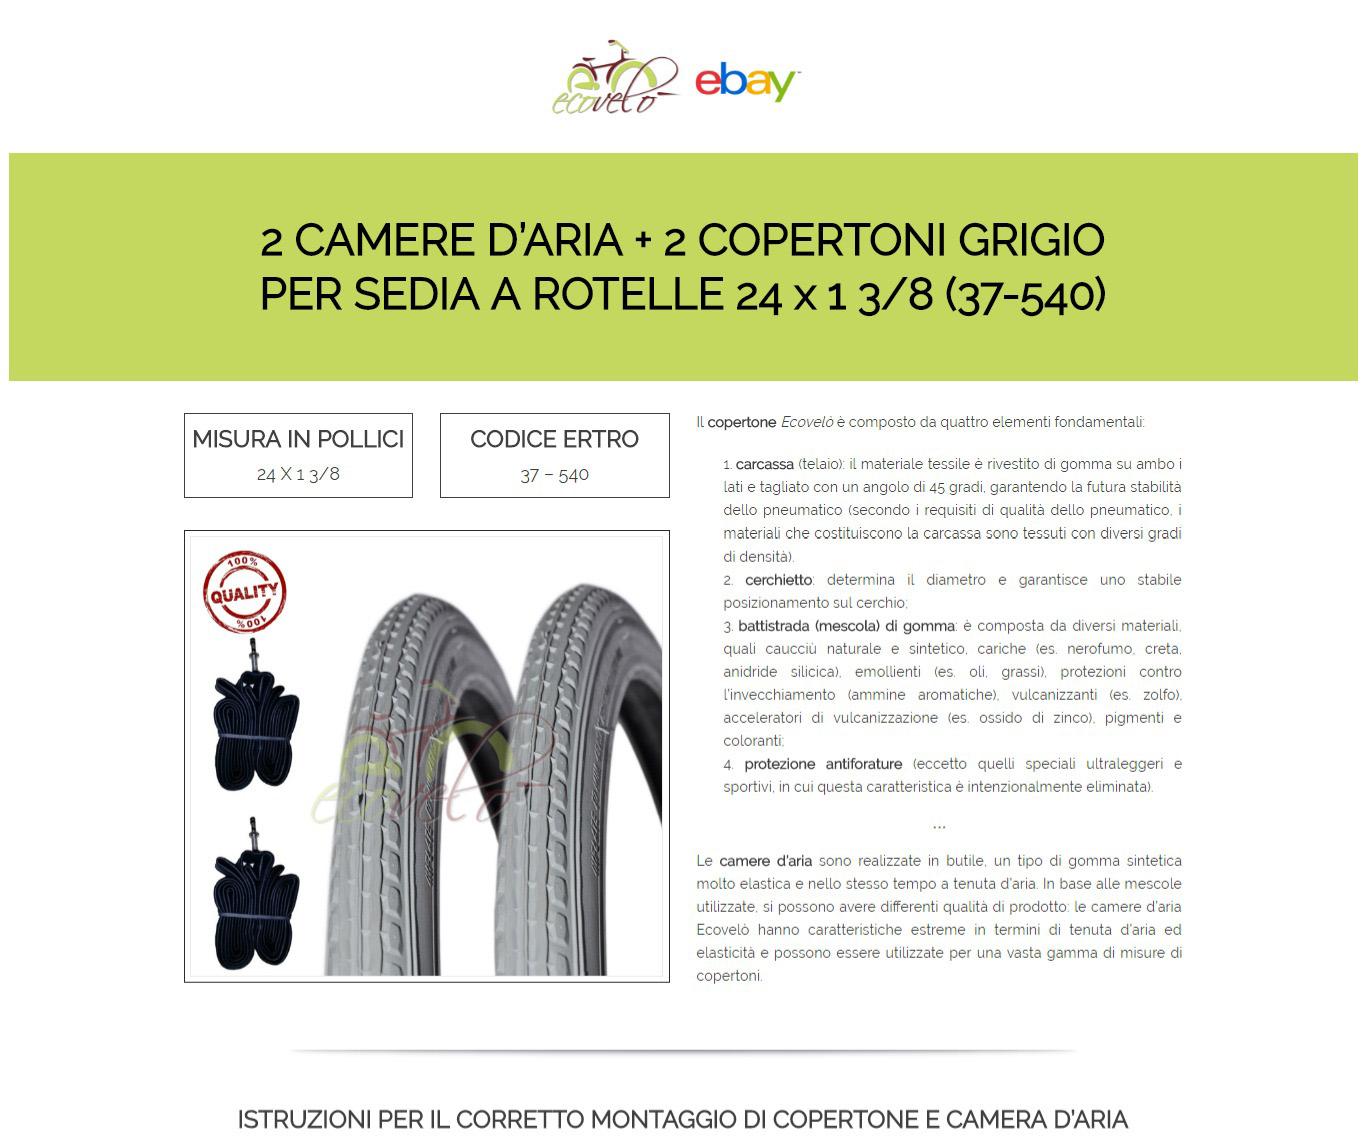 37-540 1 COPERTONE GRIGIO PER BICI BICICLETTA 24 X 1 3//8 1 CAMERA D/'ARIA